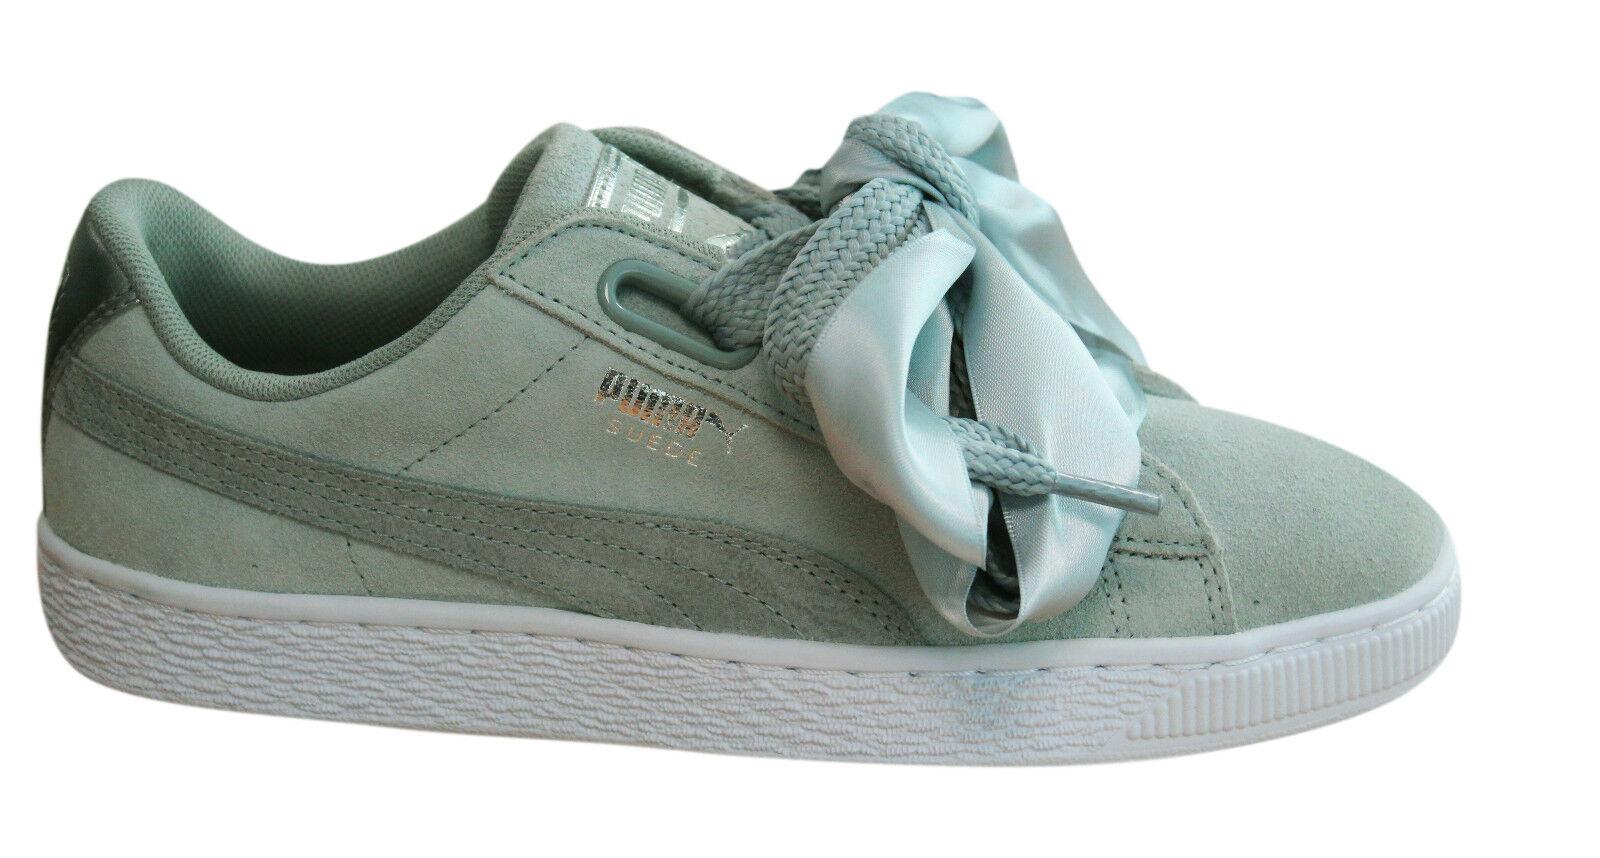 Puma Suede Heart Safari Grey Womens Trainers Lace Up Grey Safari Leather 364083 02 U29 9c864f